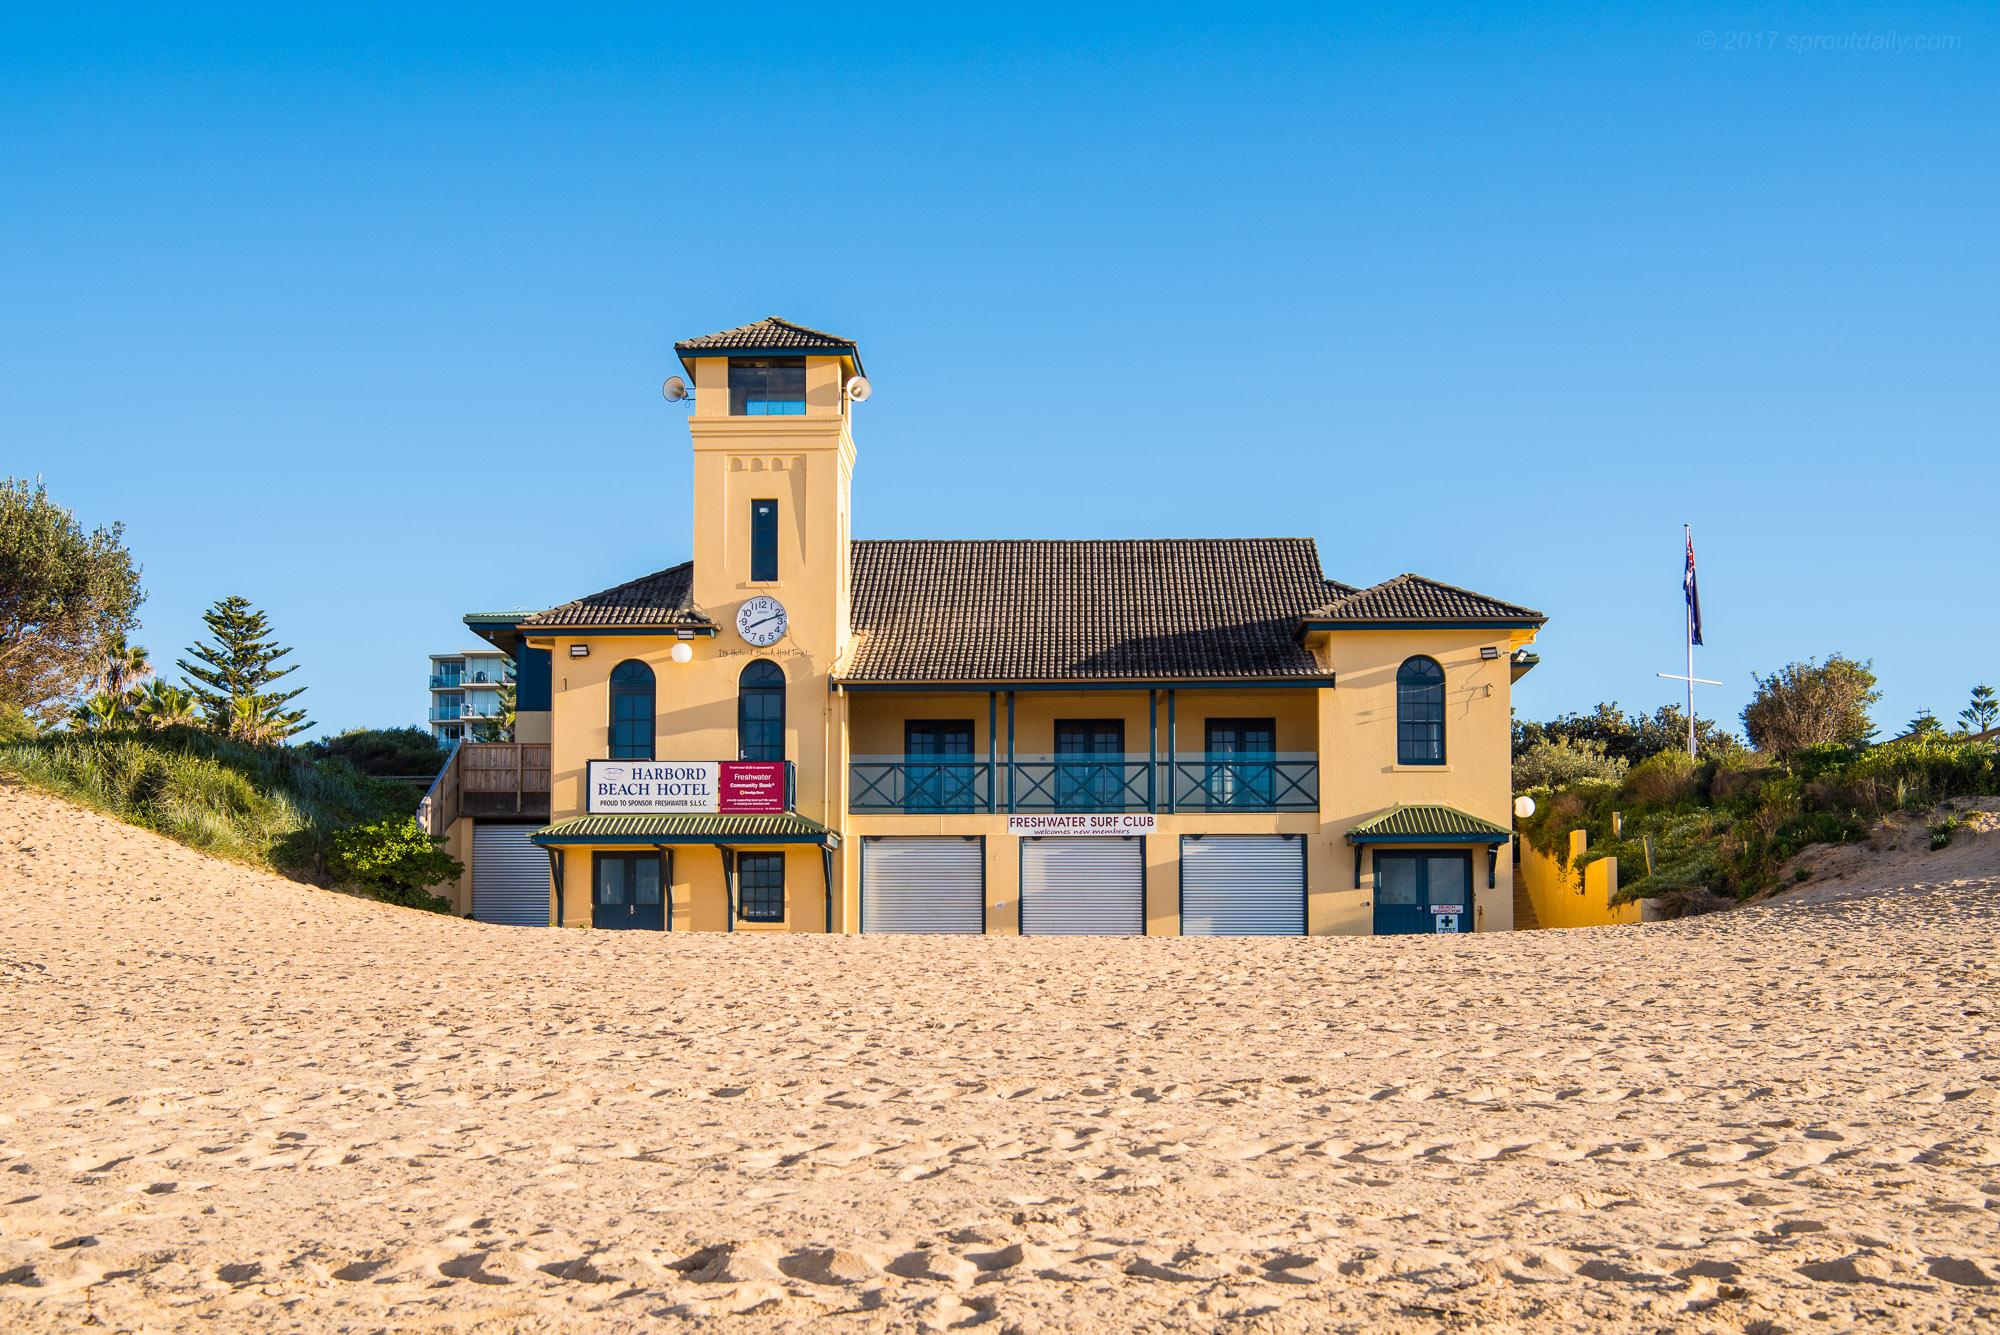 3 Car Garage - Absolute Beachfront